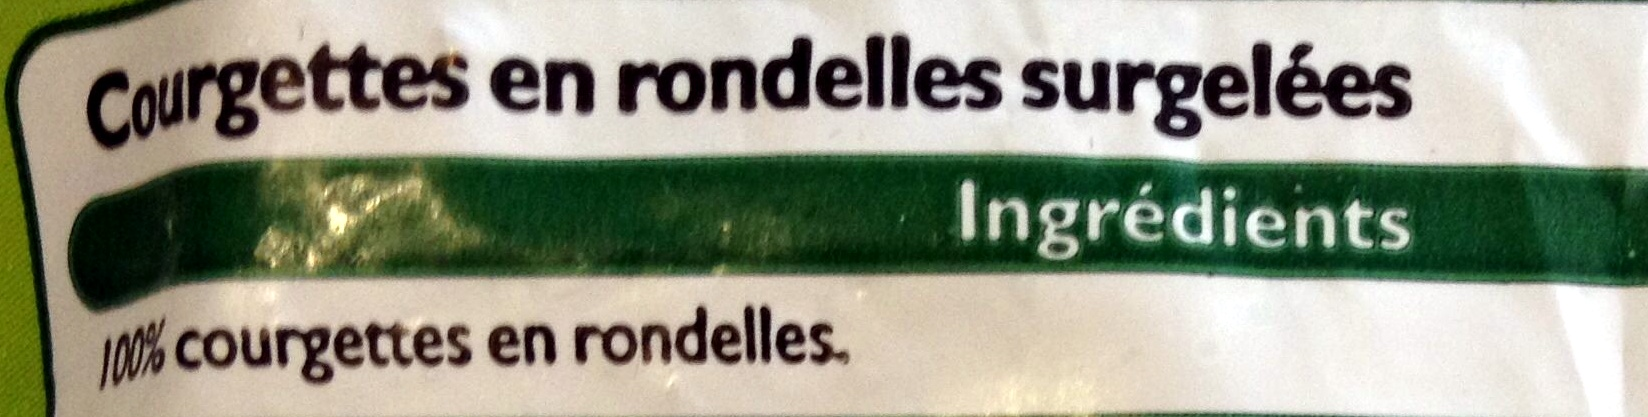 Courgettes en rondelles - Inhaltsstoffe - fr